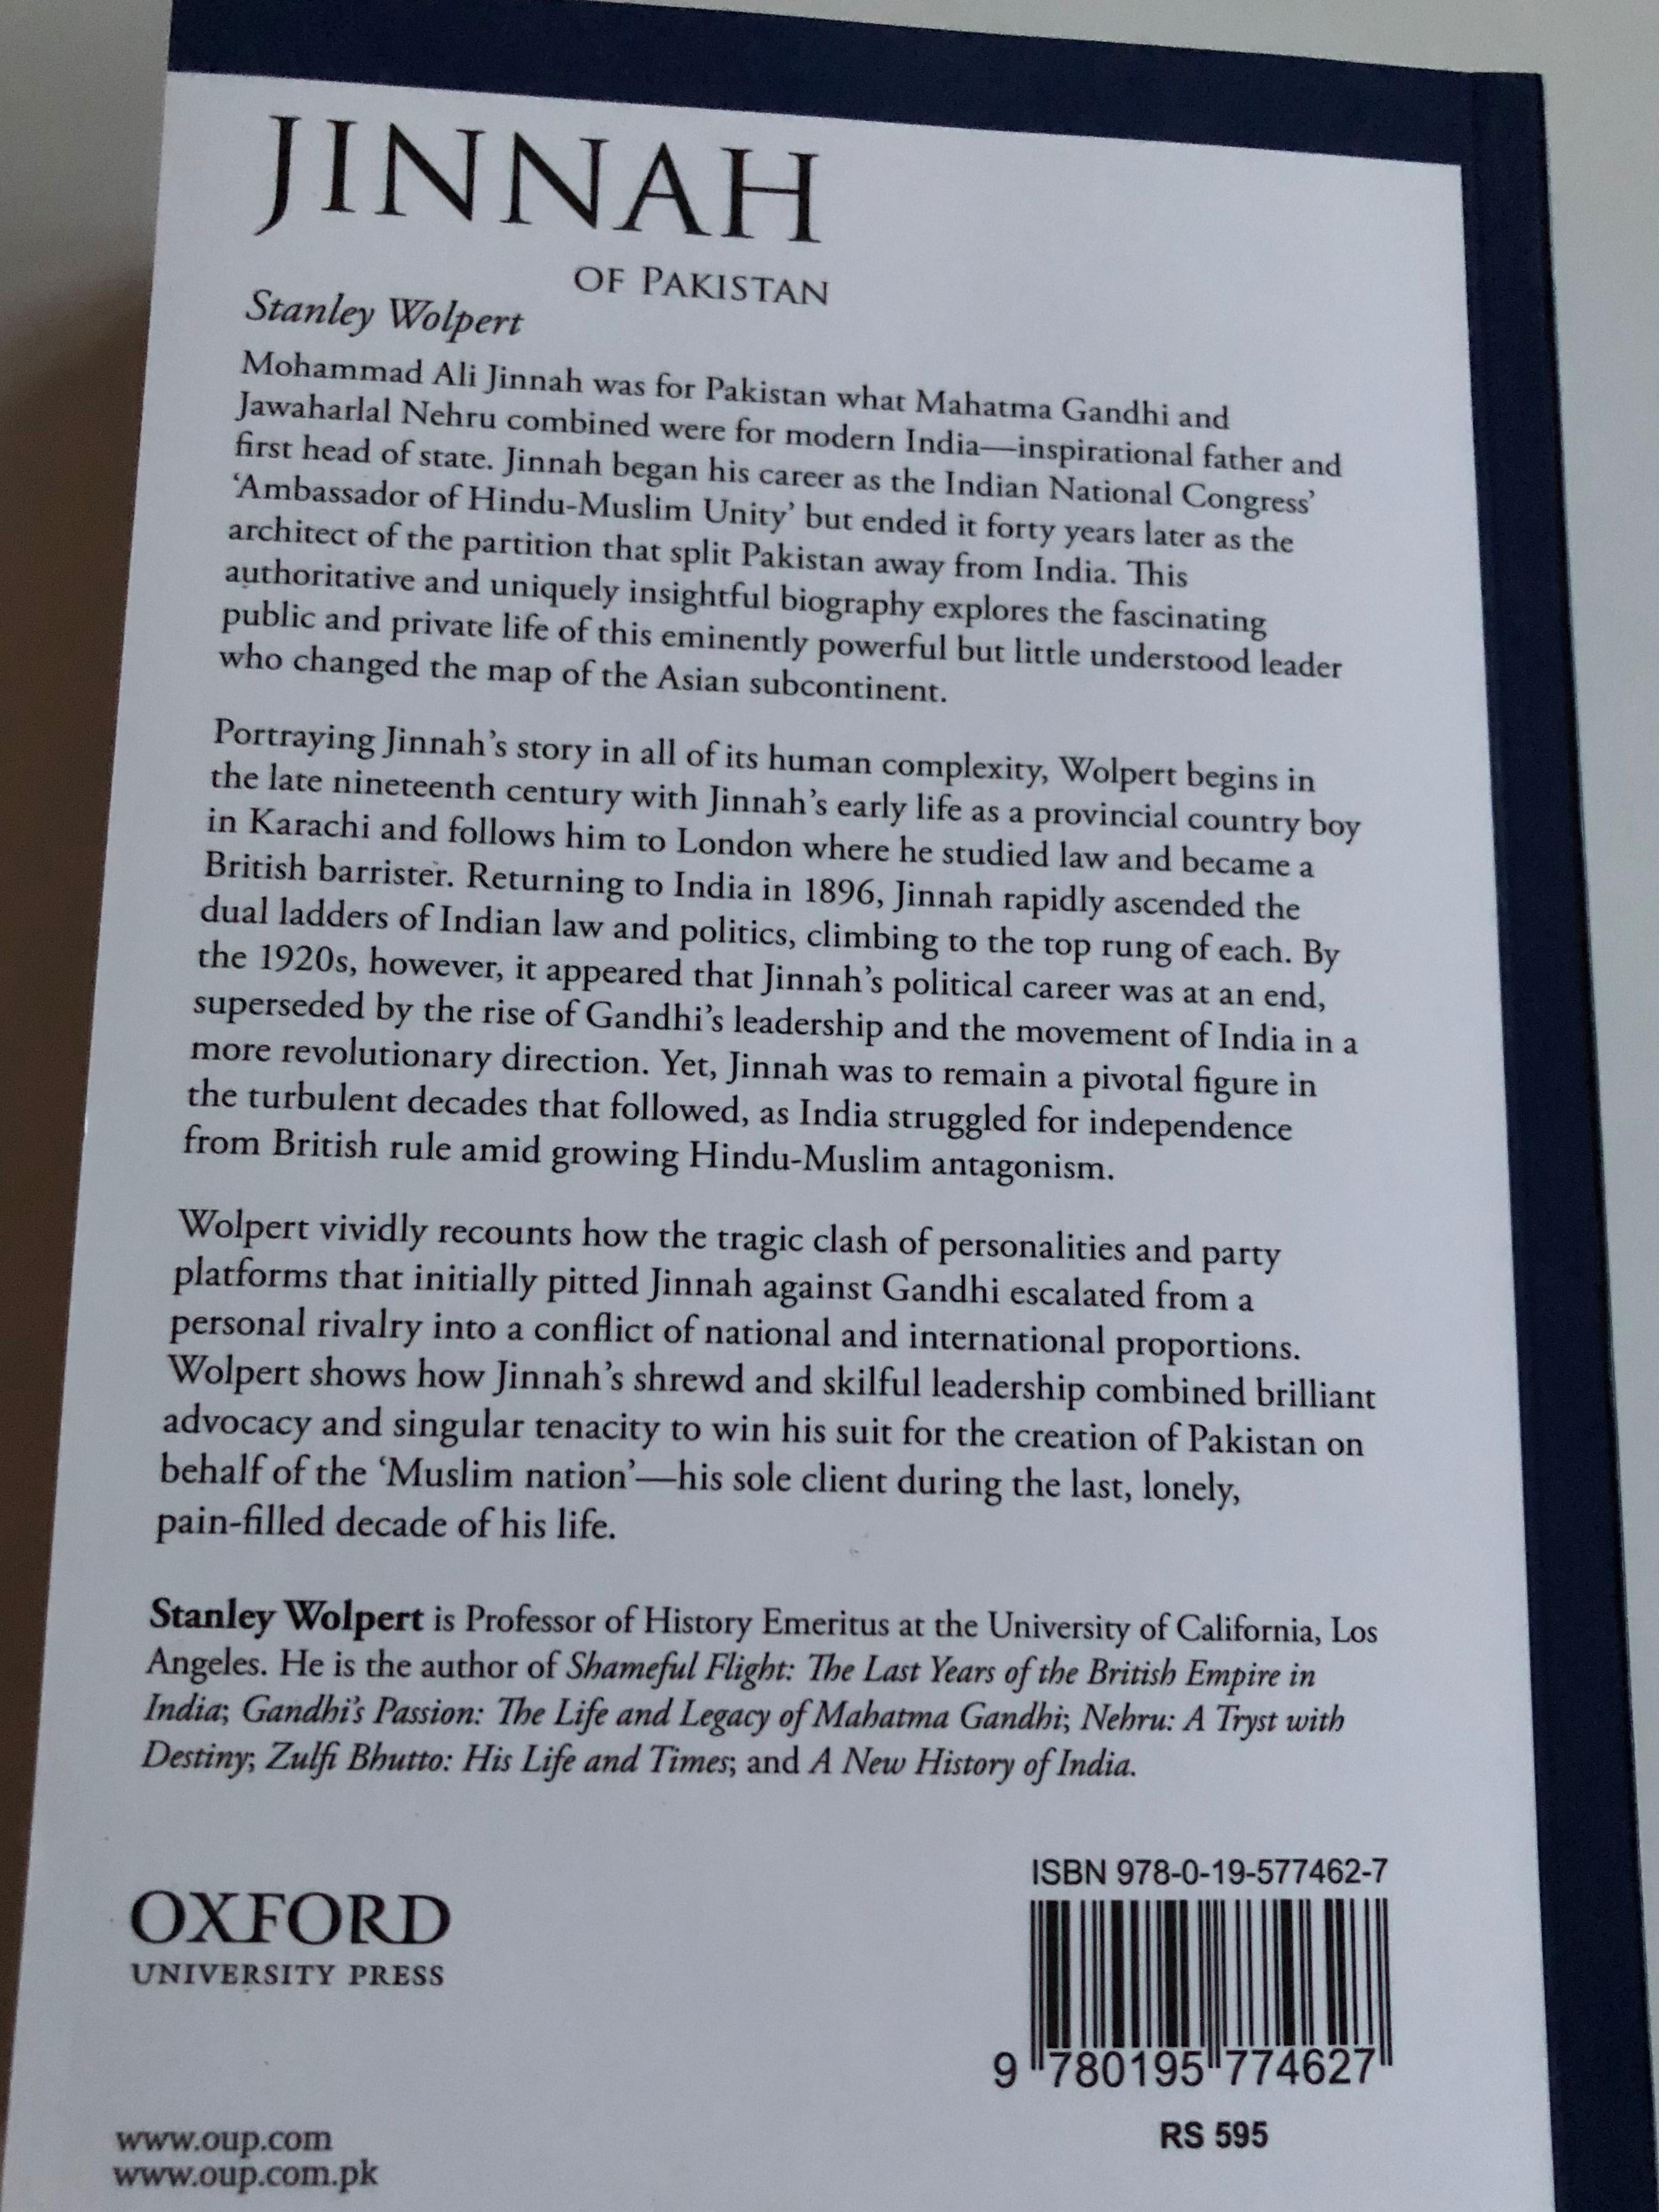 jinnah-of-pakistan-by-stanley-wolpert-oxford-pakistan-paperbacks-12-.jpg